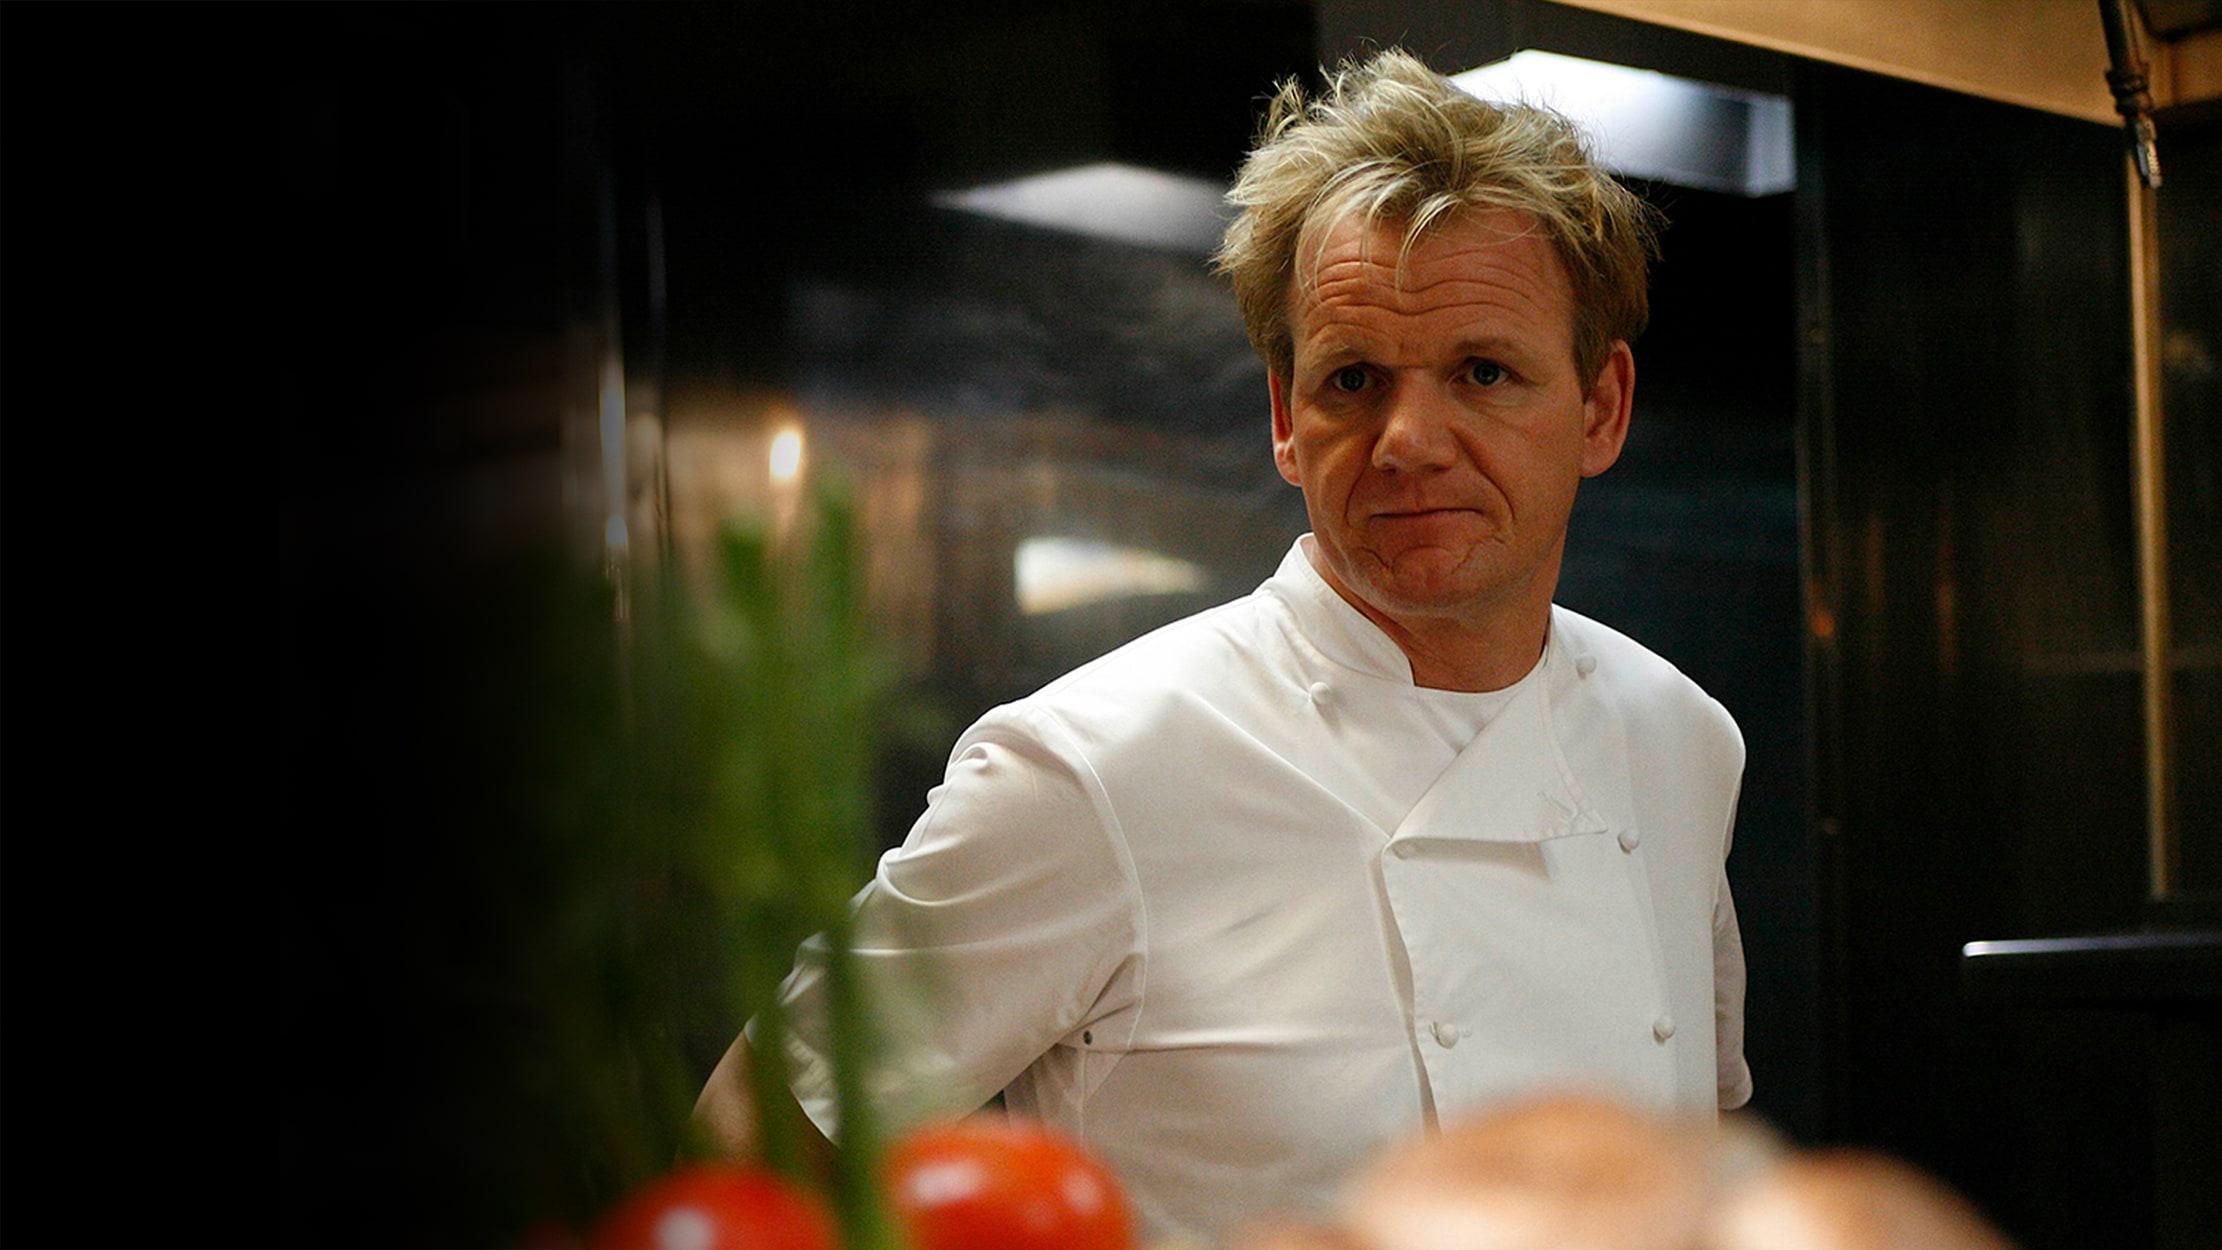 Ramsay's Kitchen Nightmares seriesDetail